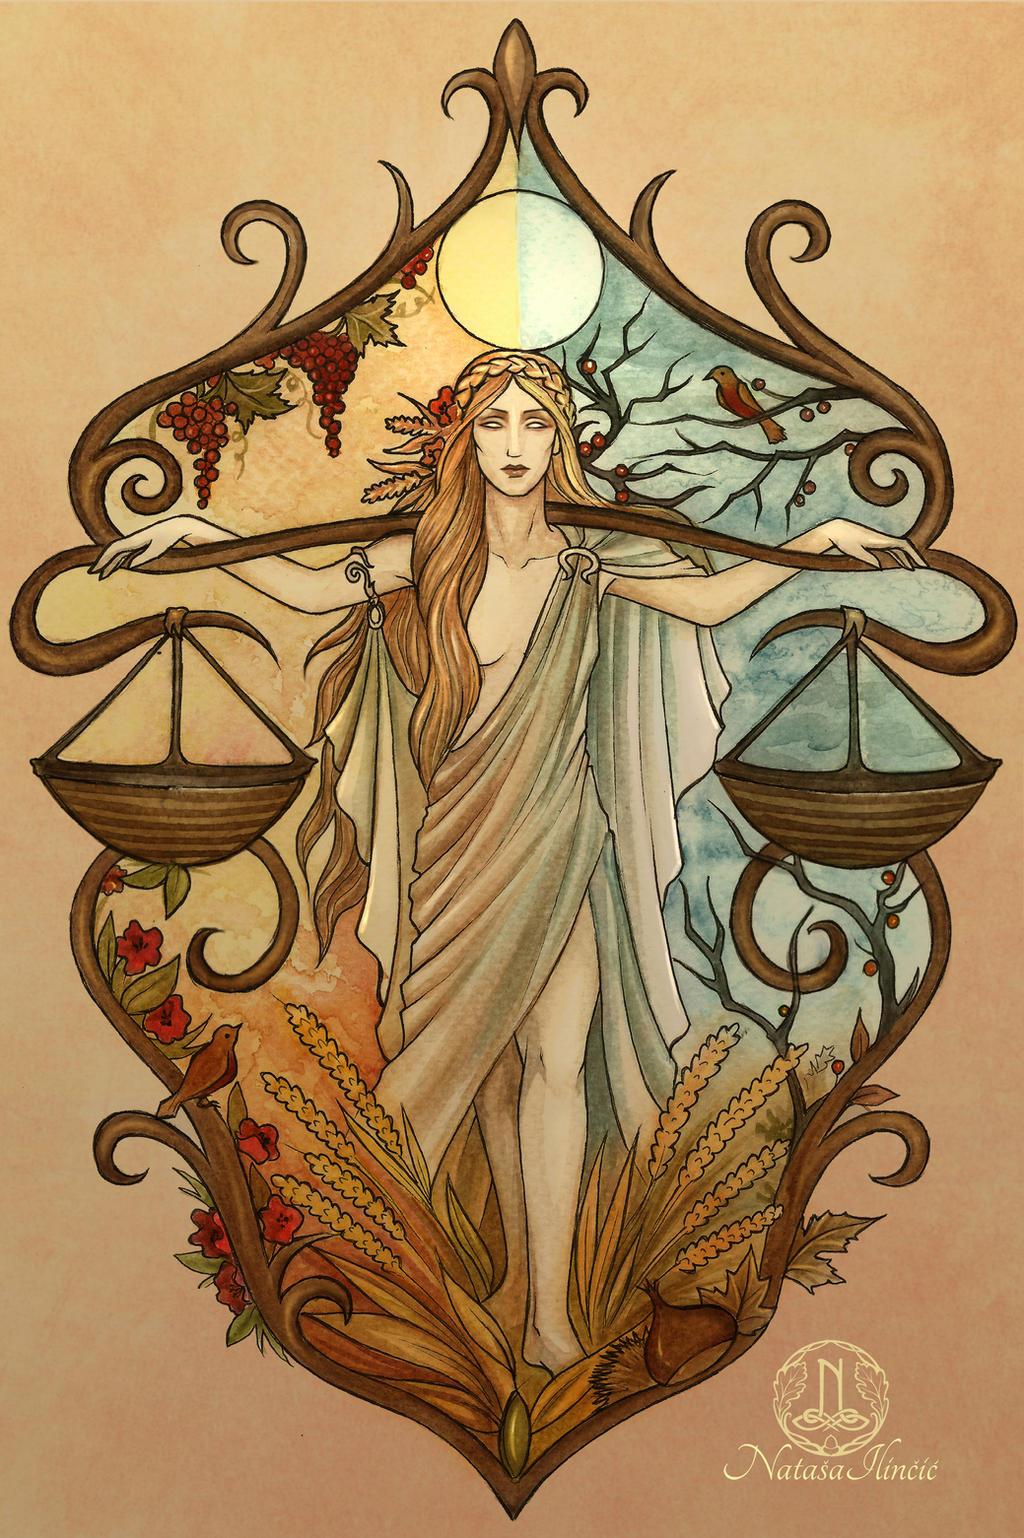 Autumn Equinox - edited by NatasaIlincic